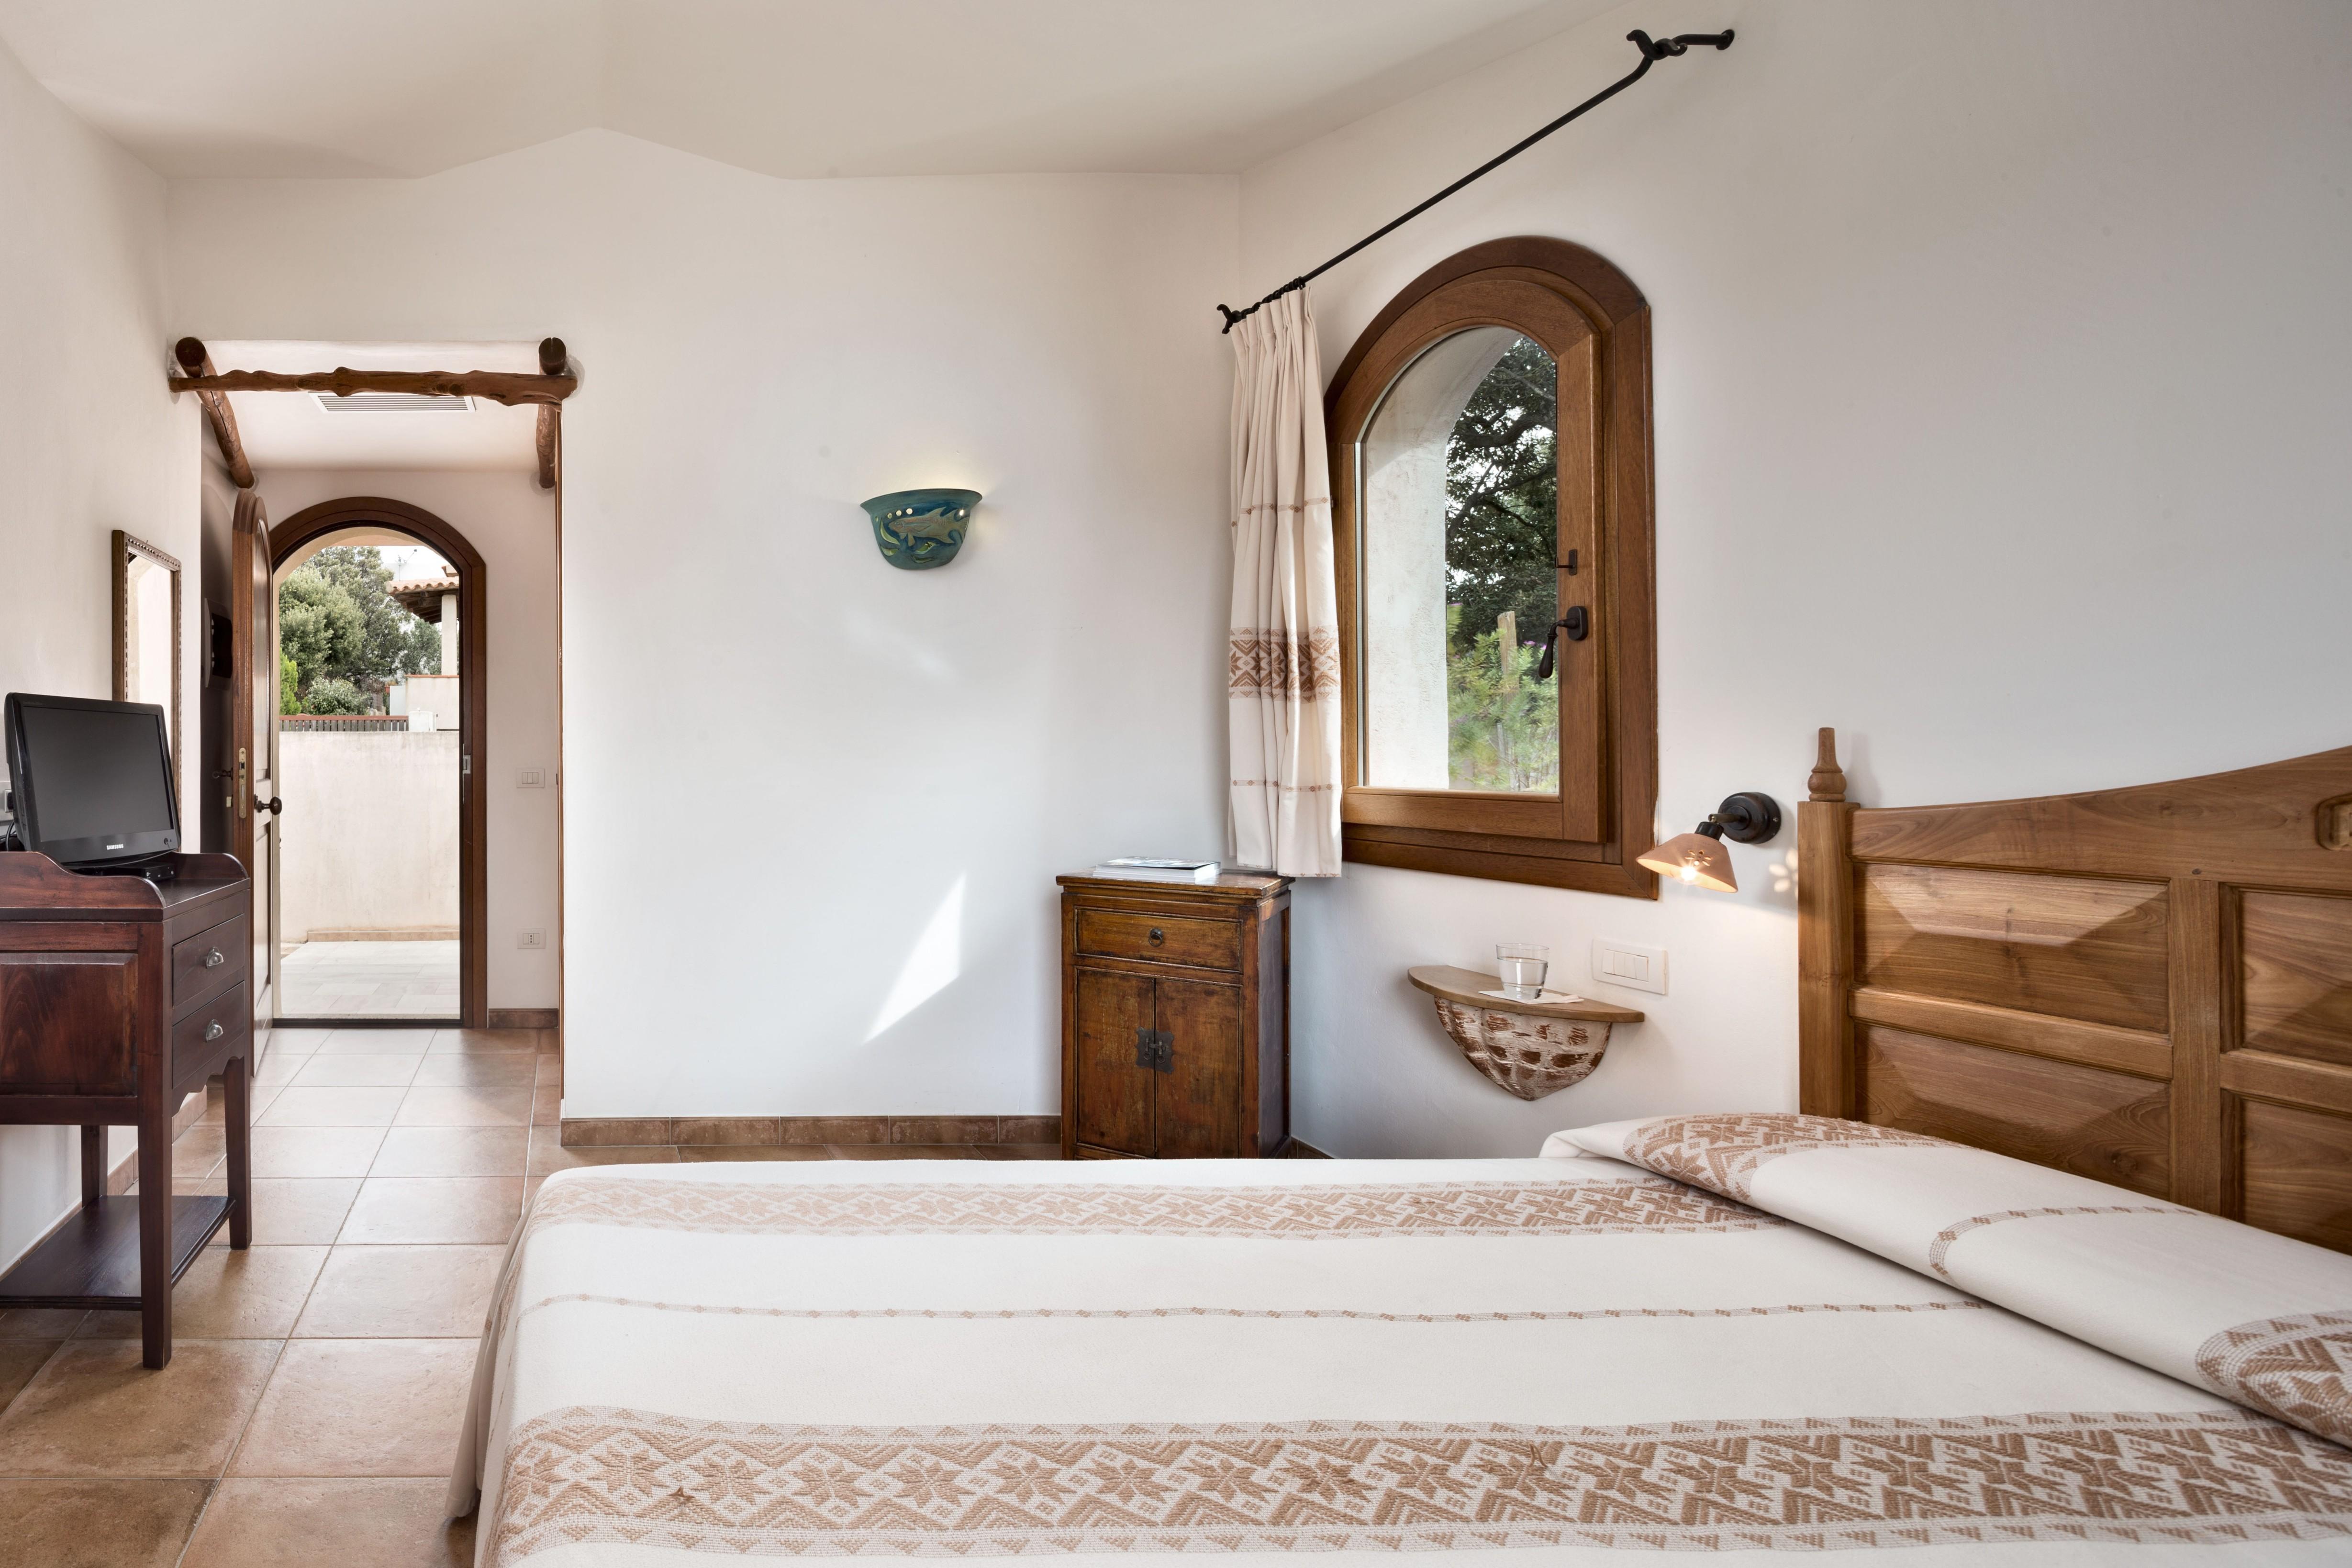 hotel-arathena-costa-smeralda-standard-room-3